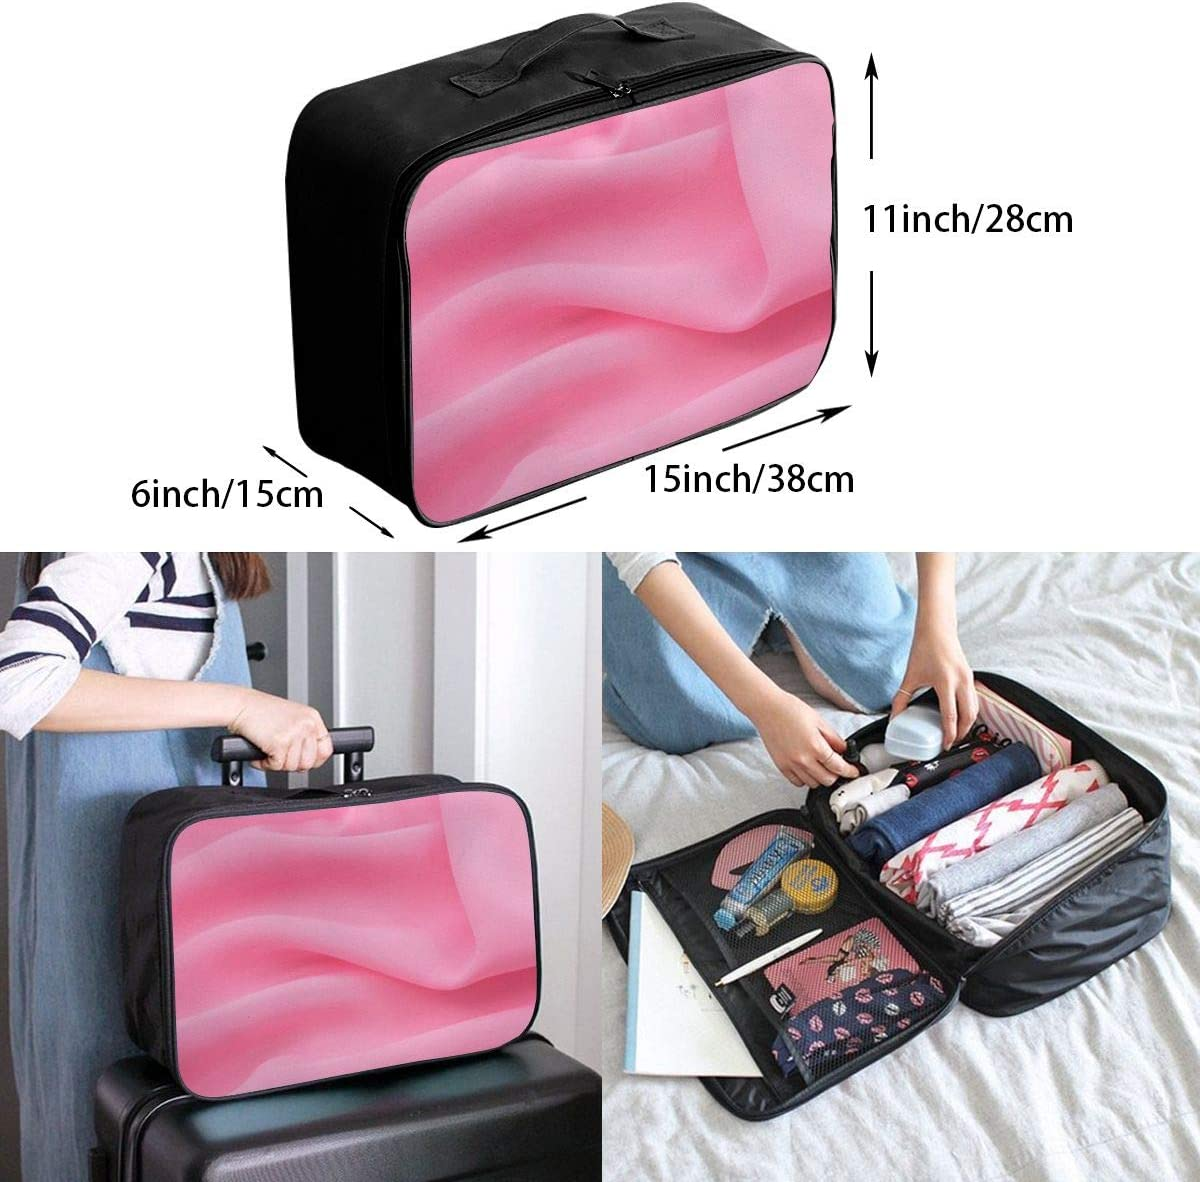 Yunshm Fabric Pink Tender Wallpaper Background Standard Customized Trolley Handbag Waterproof Unisex Large Capacity For Business Travel Storage